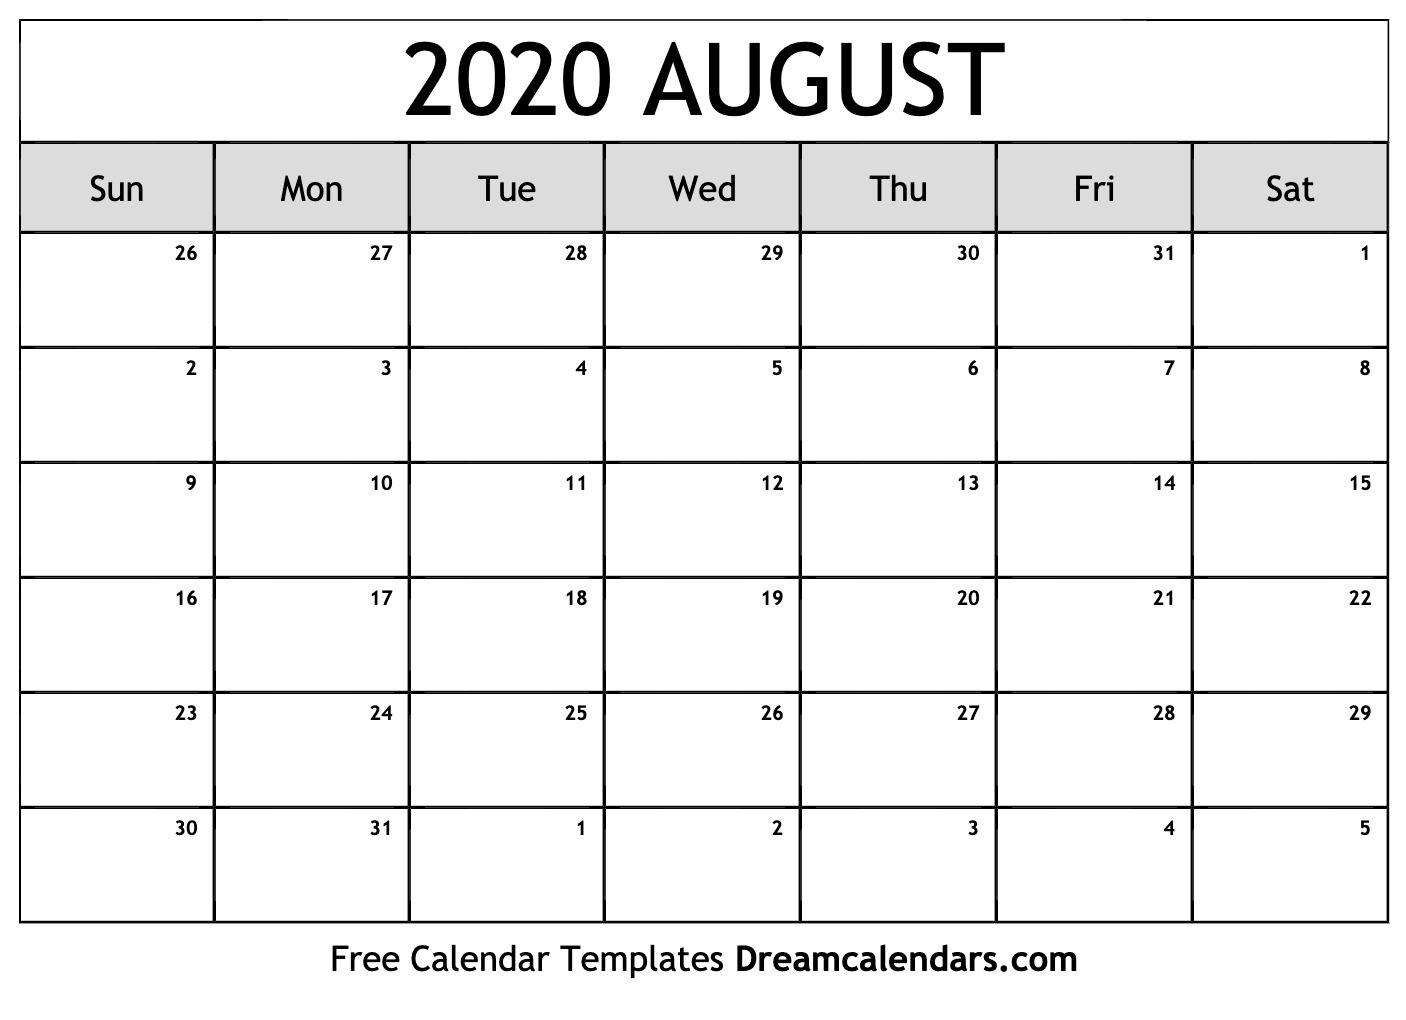 August 2020 Printable Calendar Dream Calendars 1406x1020